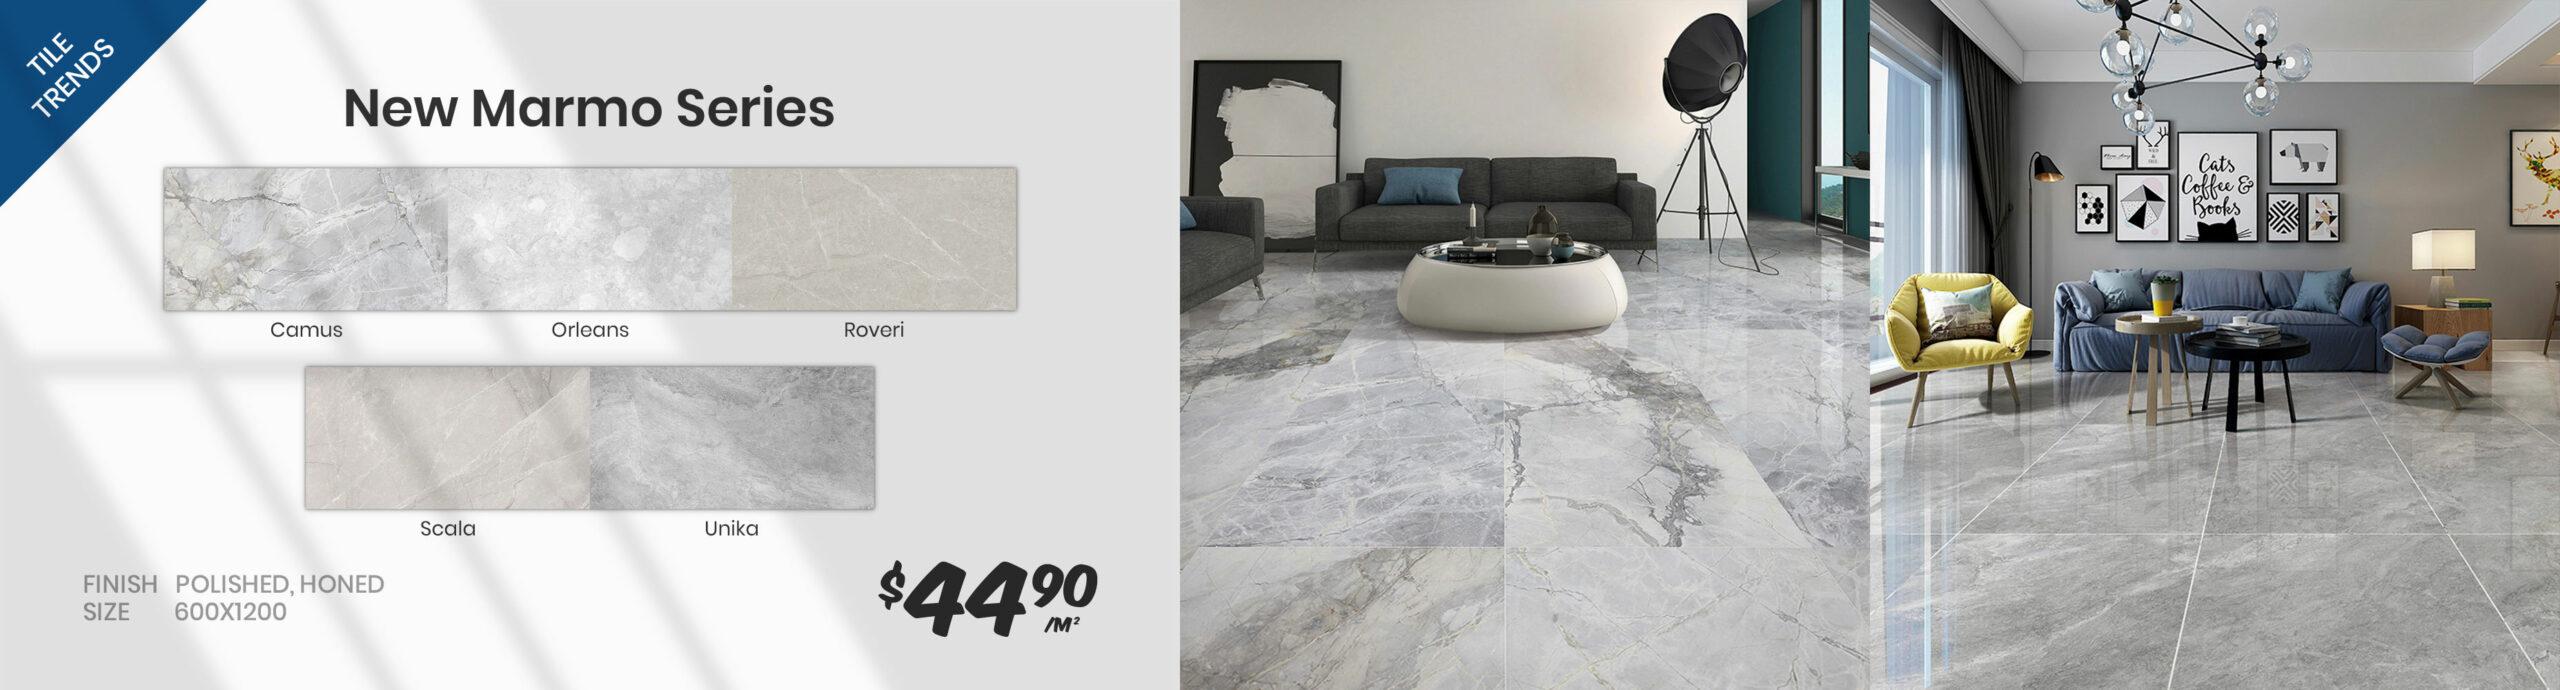 New marmo series tiles